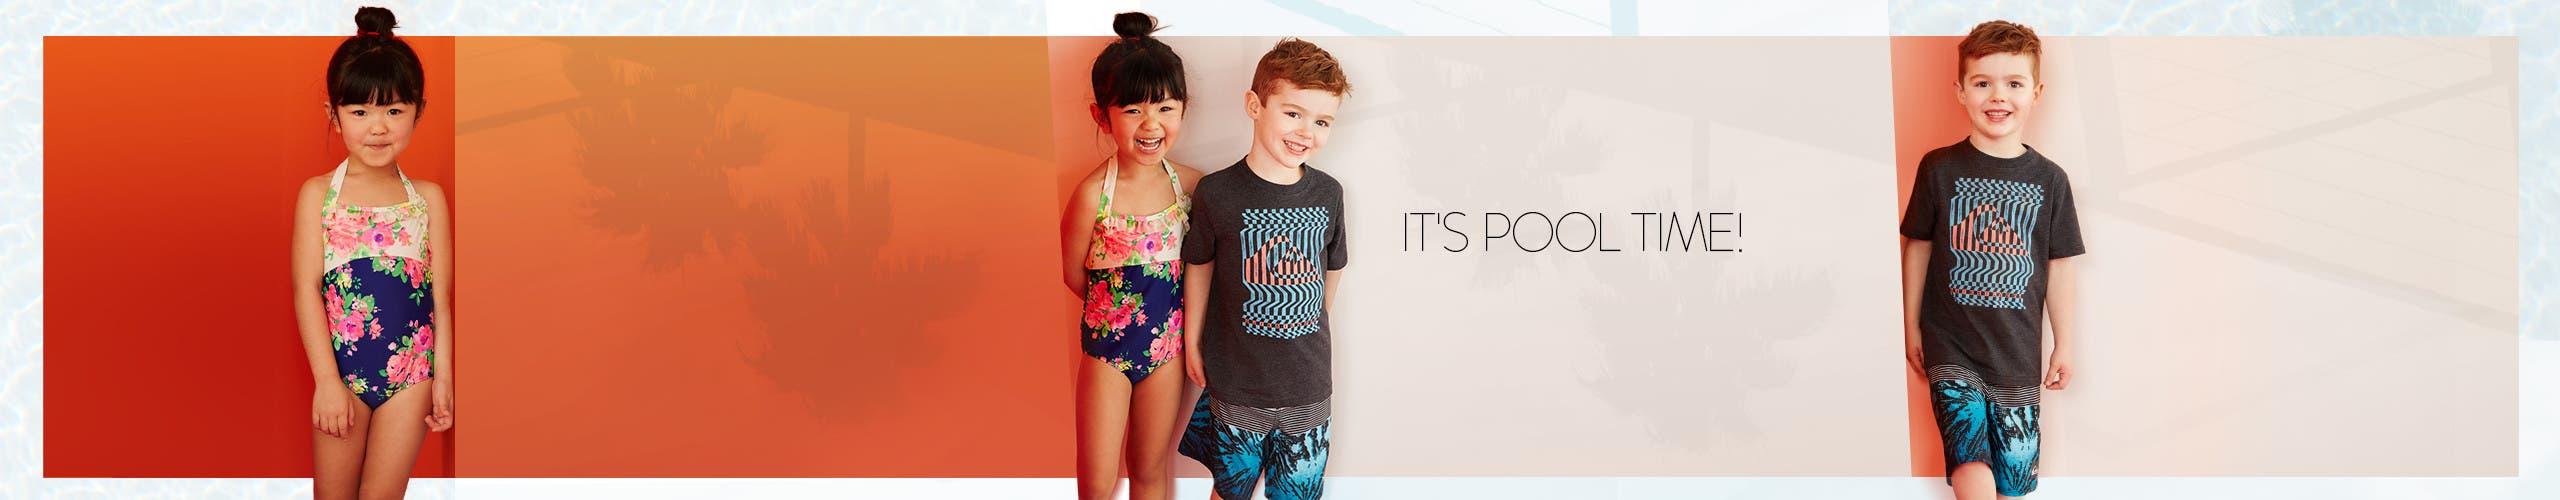 It's pool time: kids' swimwear.